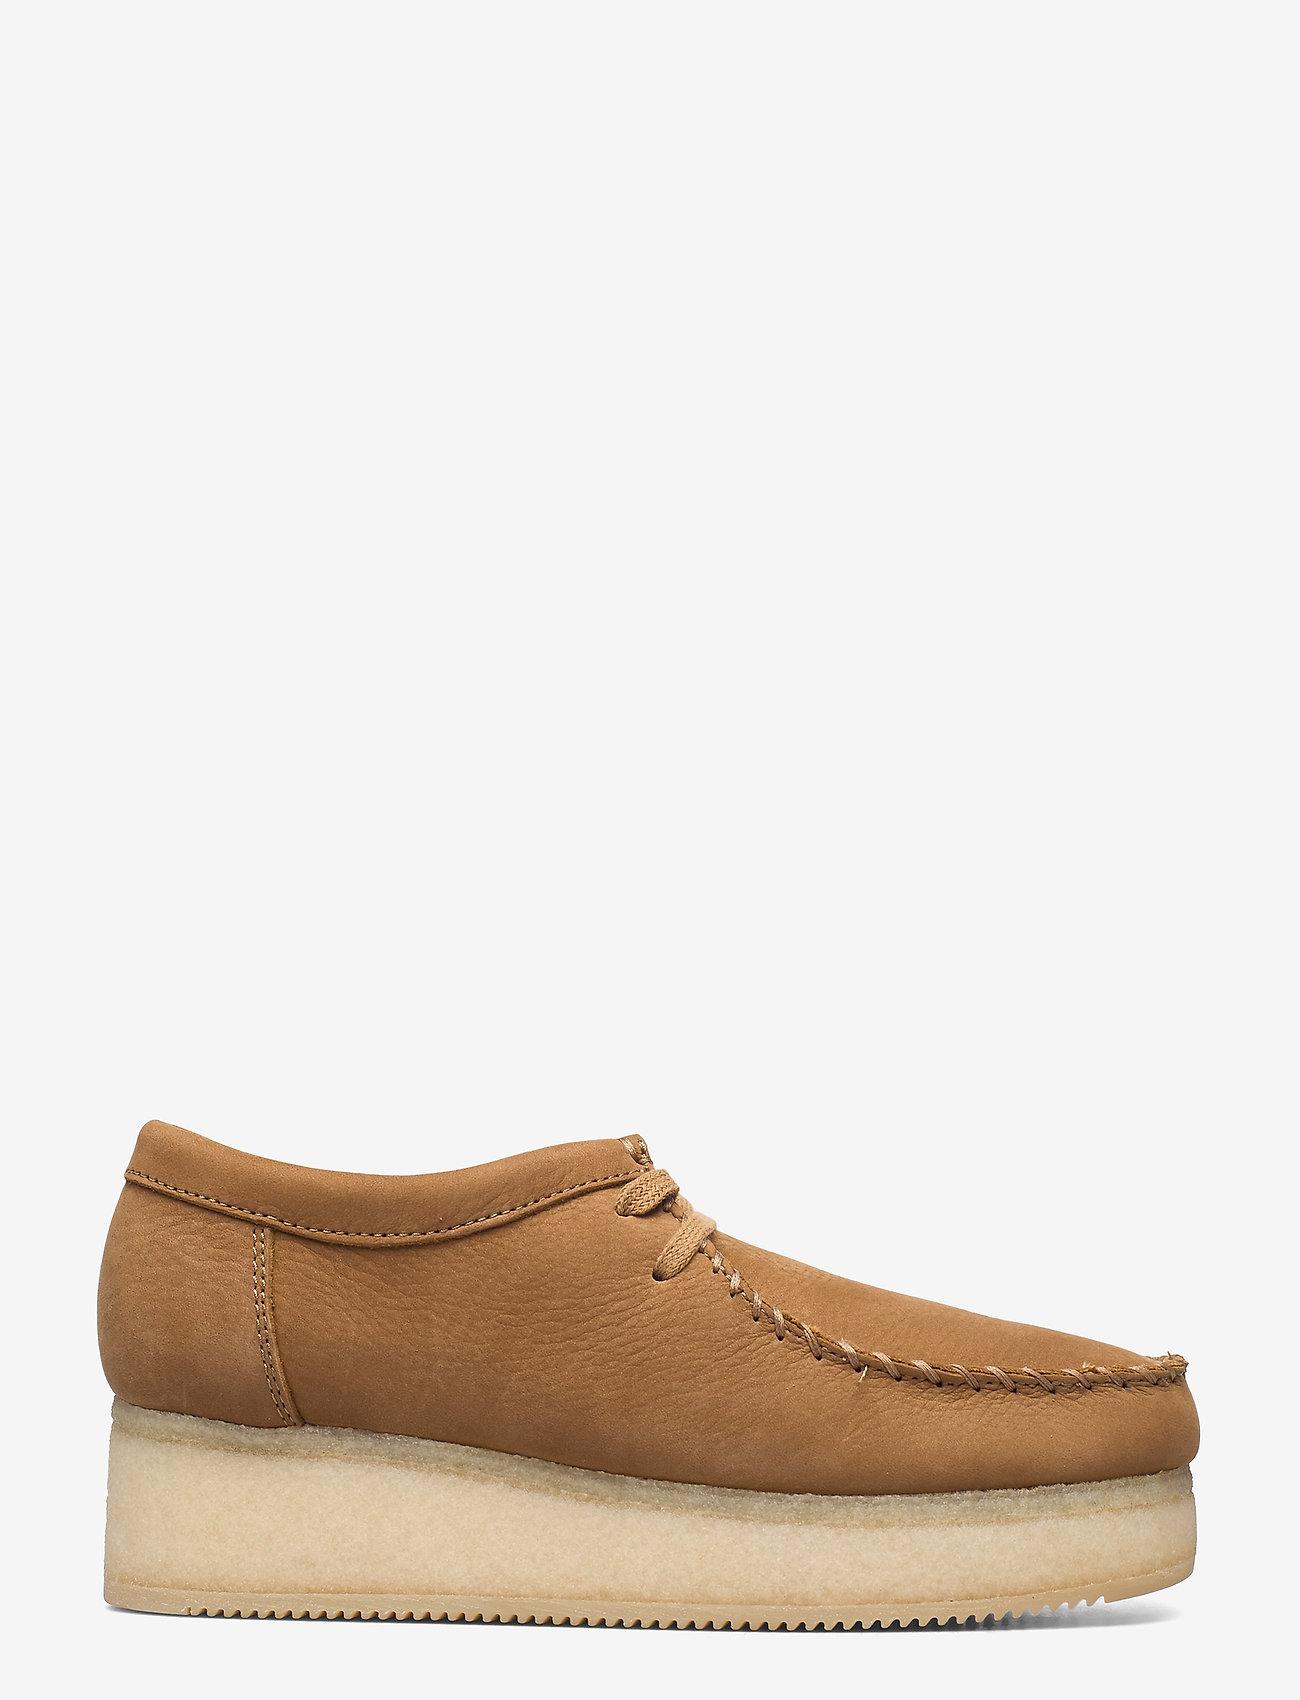 Clarks Originals - Wallacraft Lo - buty sznurowane - oak nubuck - 1